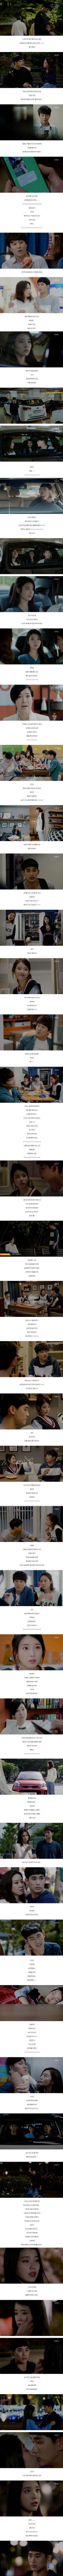 [Spoiler] Added episodes 7 and 8 captures for the Korean drama 'Producers' @ HanCinema :: The Korean Movie and Drama Database Cha Tae Hyun, Kim Jong Kook, Gong Hyo Jin, Her Music, Korean Drama, Movie, Film, Drama Korea, Cinema